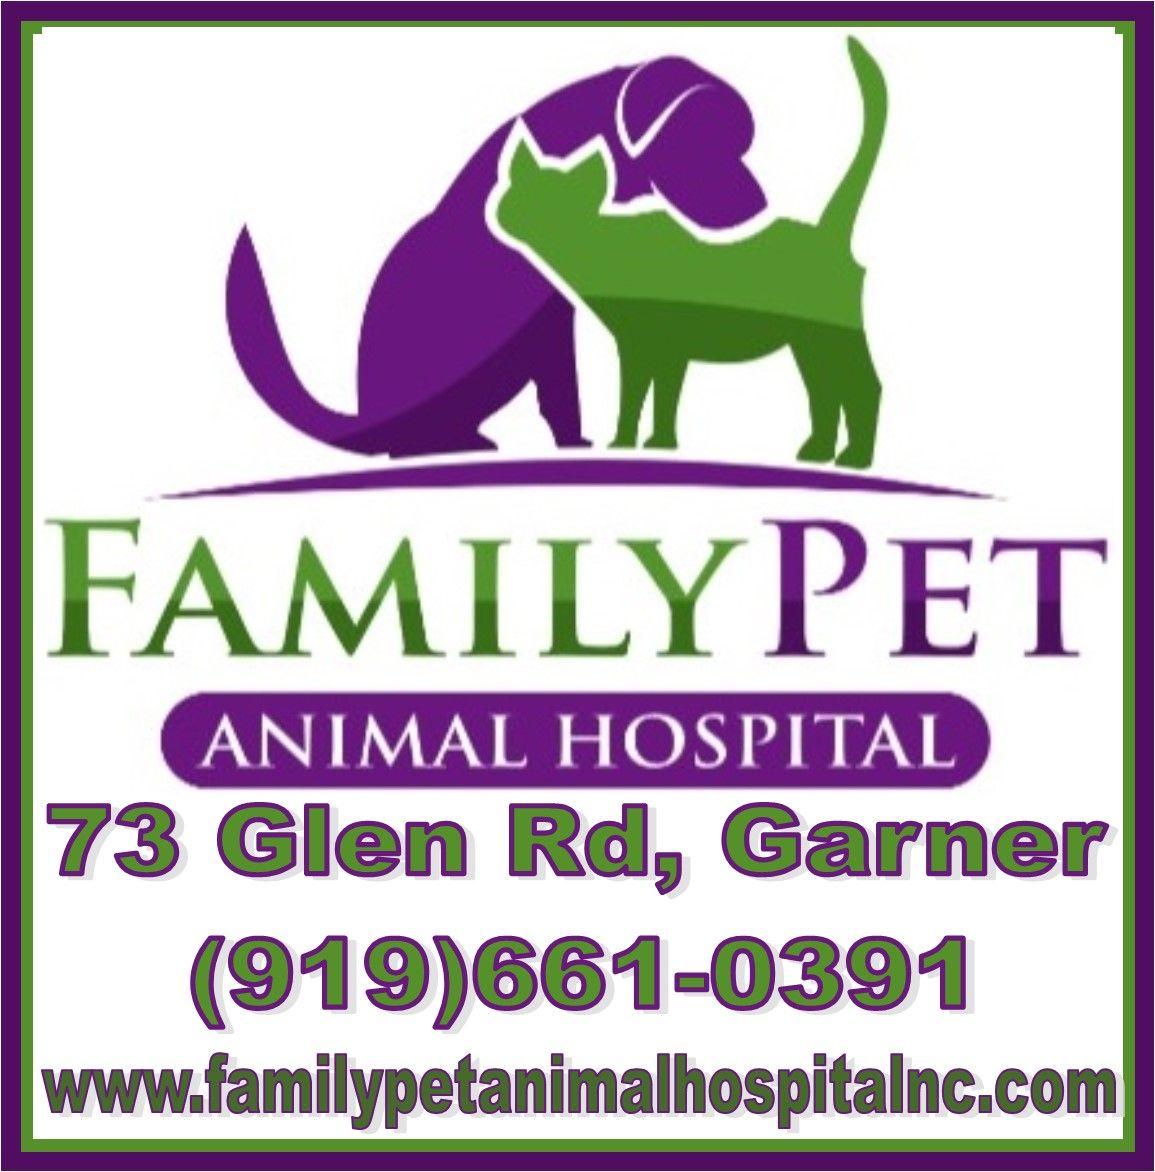 Family pet animal hospital animal hospital family pet